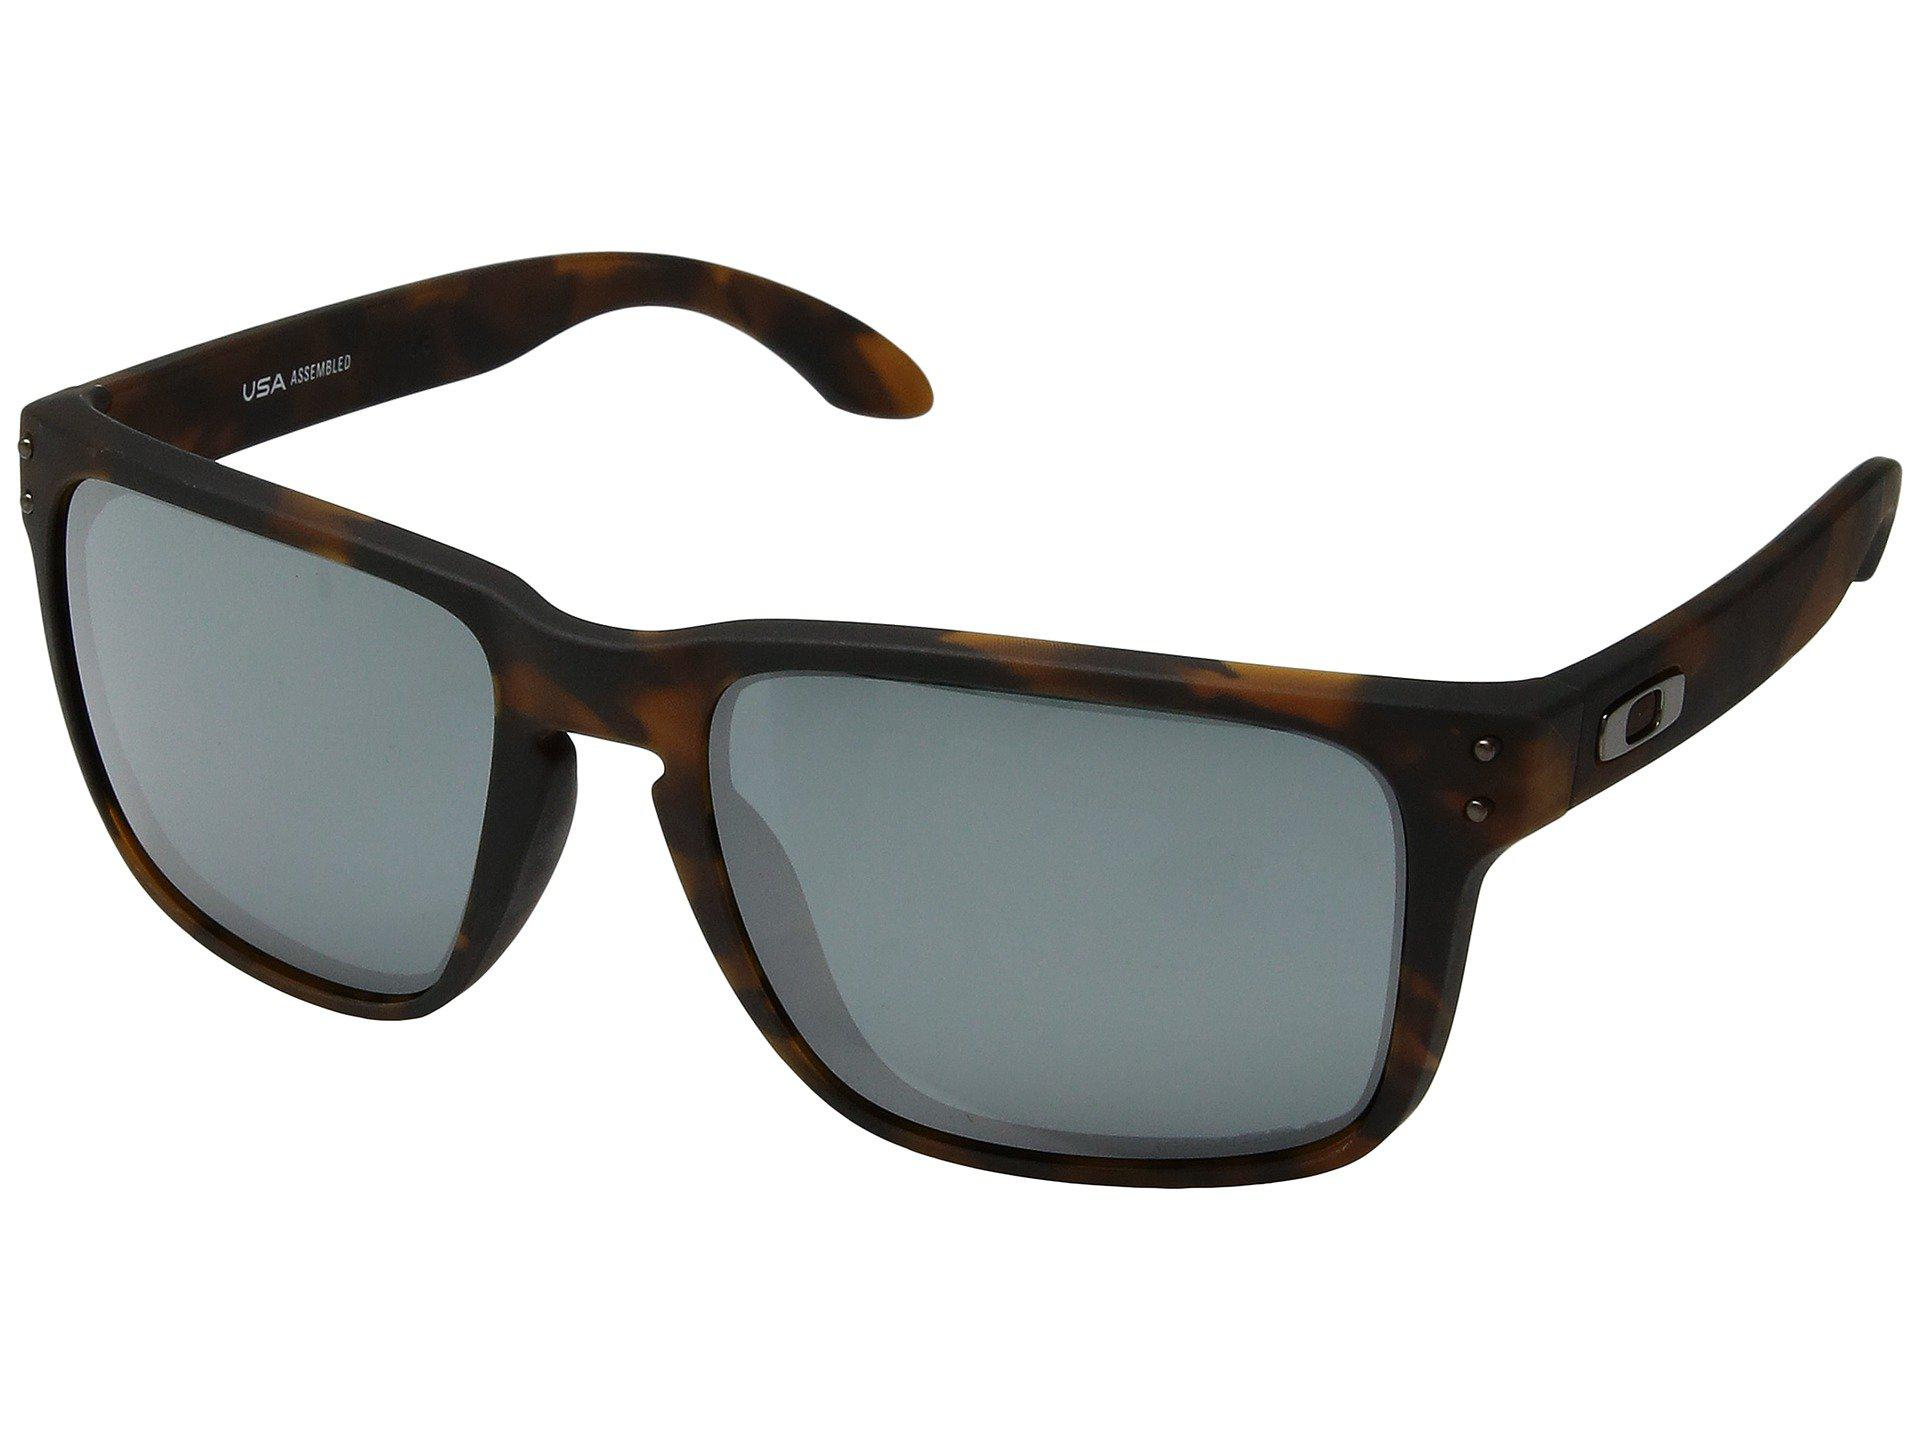 7dfe0738ecb Lyst - Oakley Sliver Xl in Brown